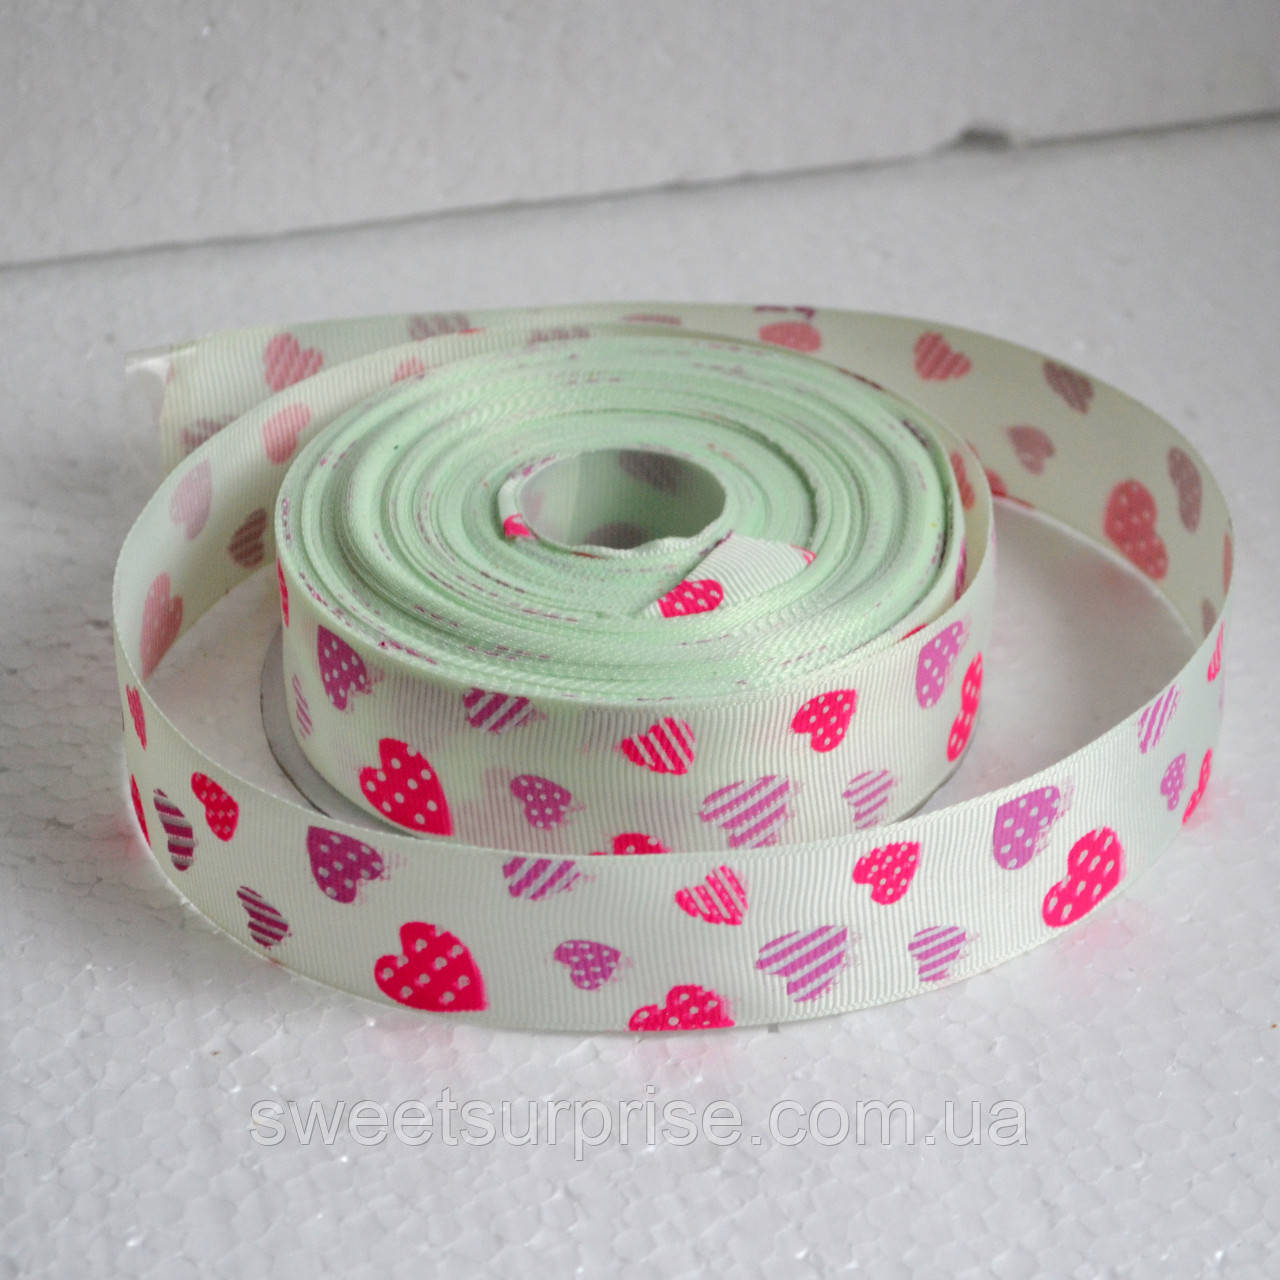 Лента репсовая декоративная 25 мм (сердечки)